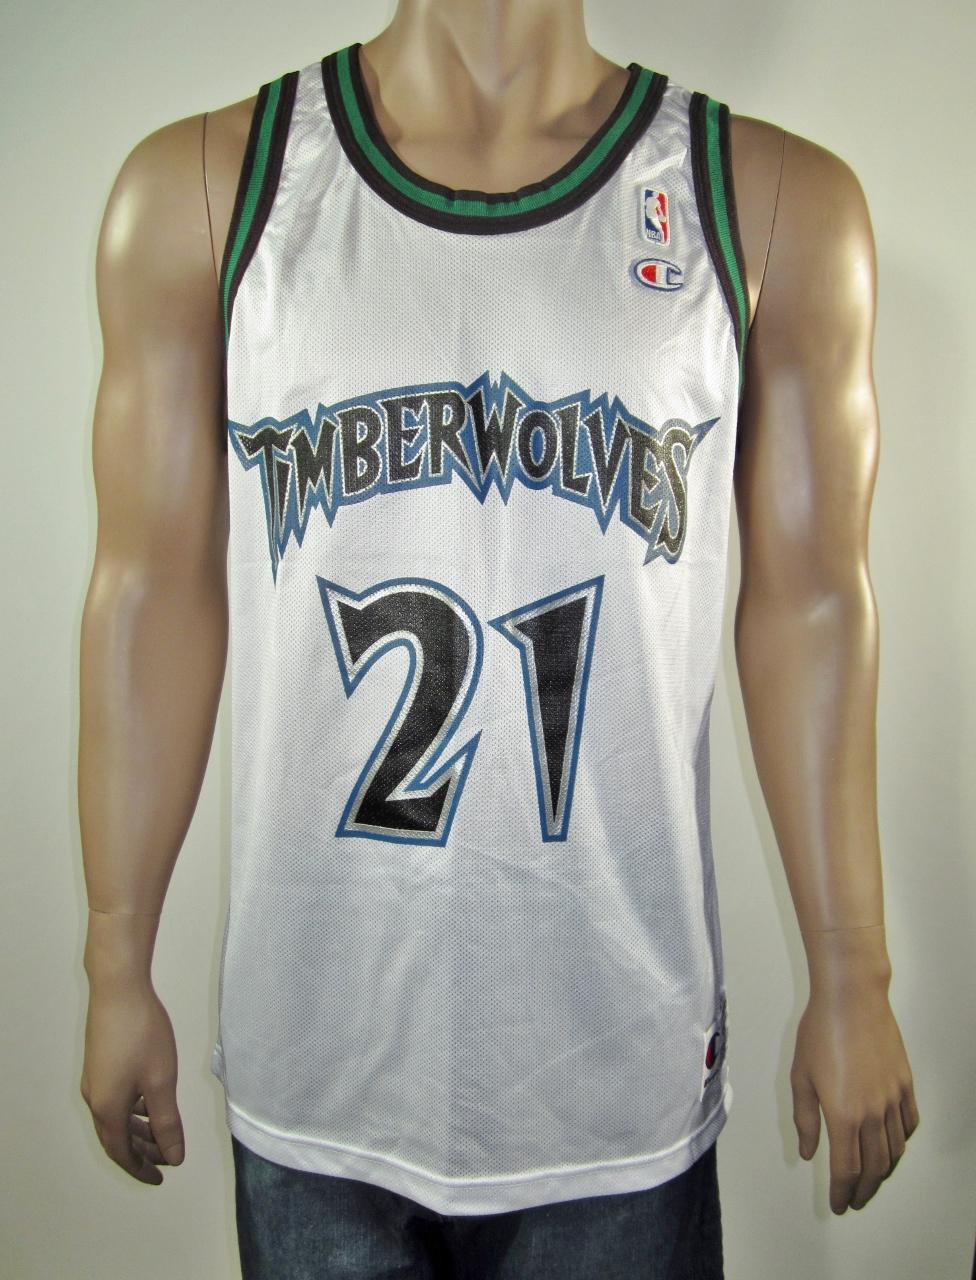 74827570ee8 Kevin Garnett Minnesota Timberwolves Champion Jersey 44 NWT on Storenvy